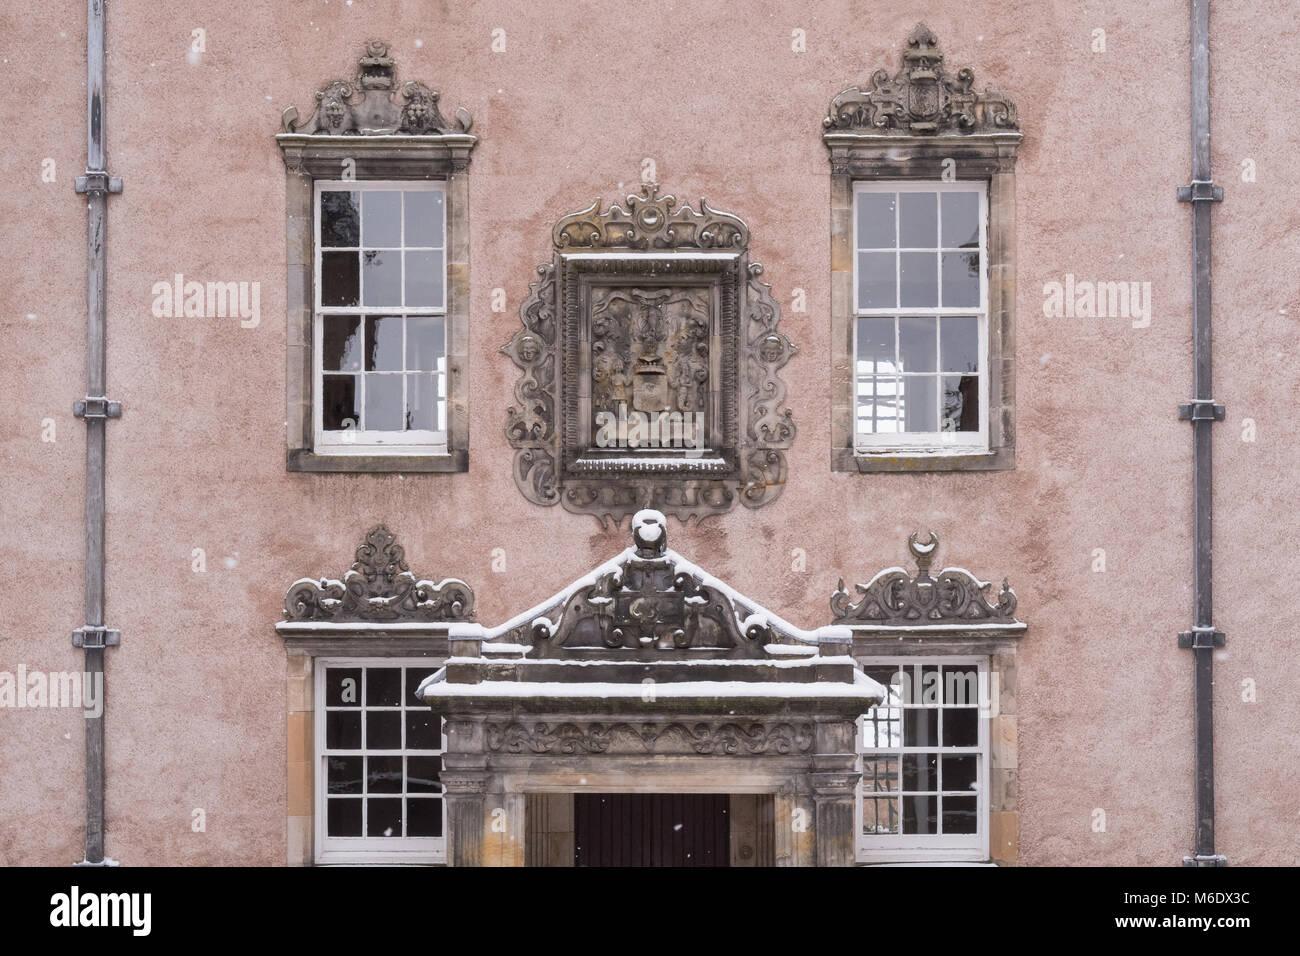 Argyll's Lodging, Stirling Old Town, Scotland, UK - Stock Image